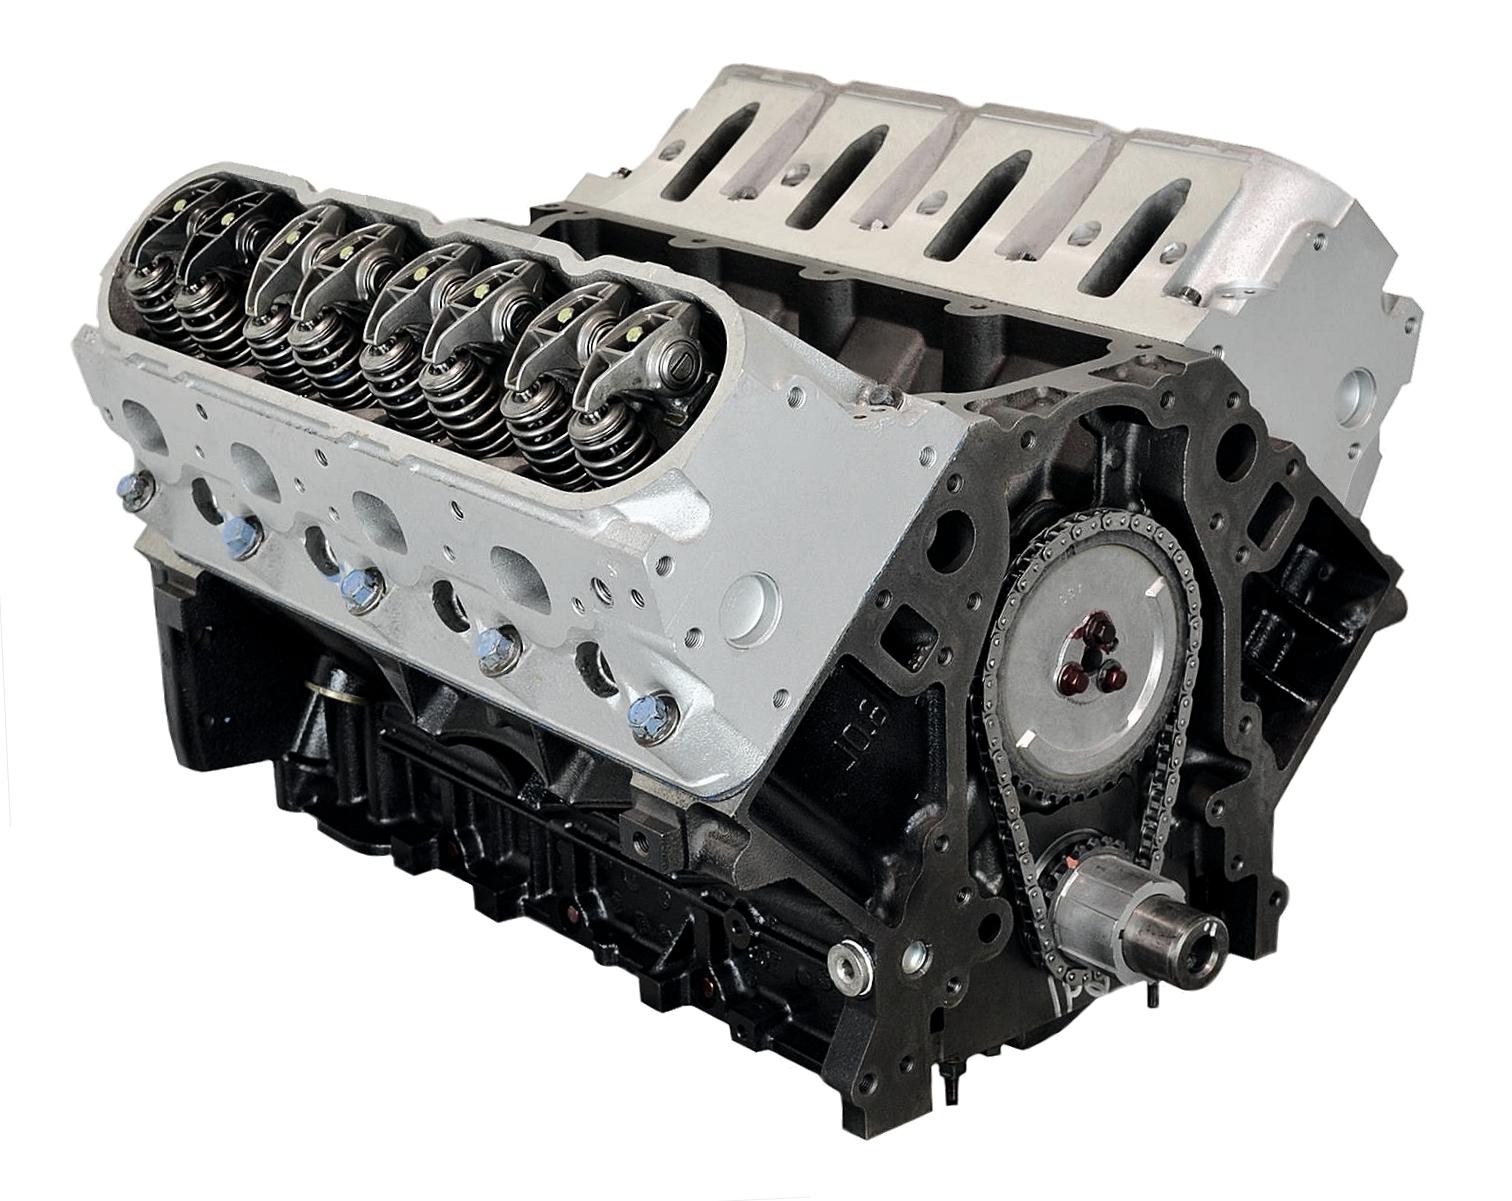 5.3 GM L59 Reman Long Block Engine GMC Yukon Vin Code: T